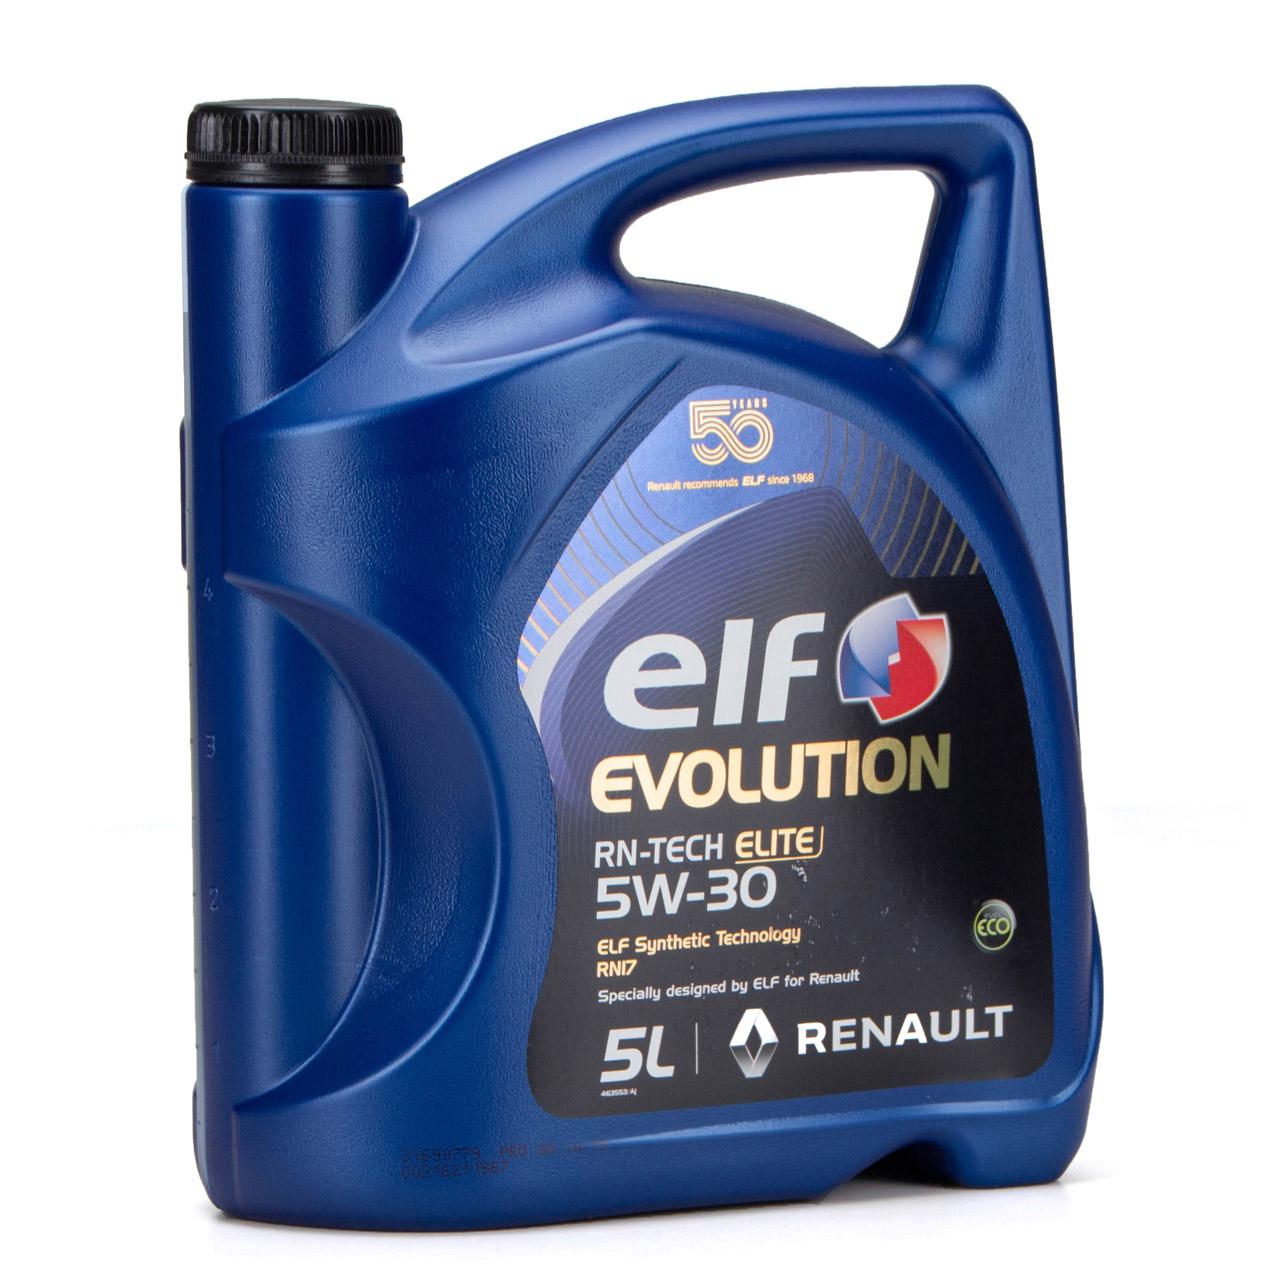 elf Evolution RN-TECH ELITE 5W-30 5W30 Motoröl Öl C3 Renault RN17 - 6L 6 Liter